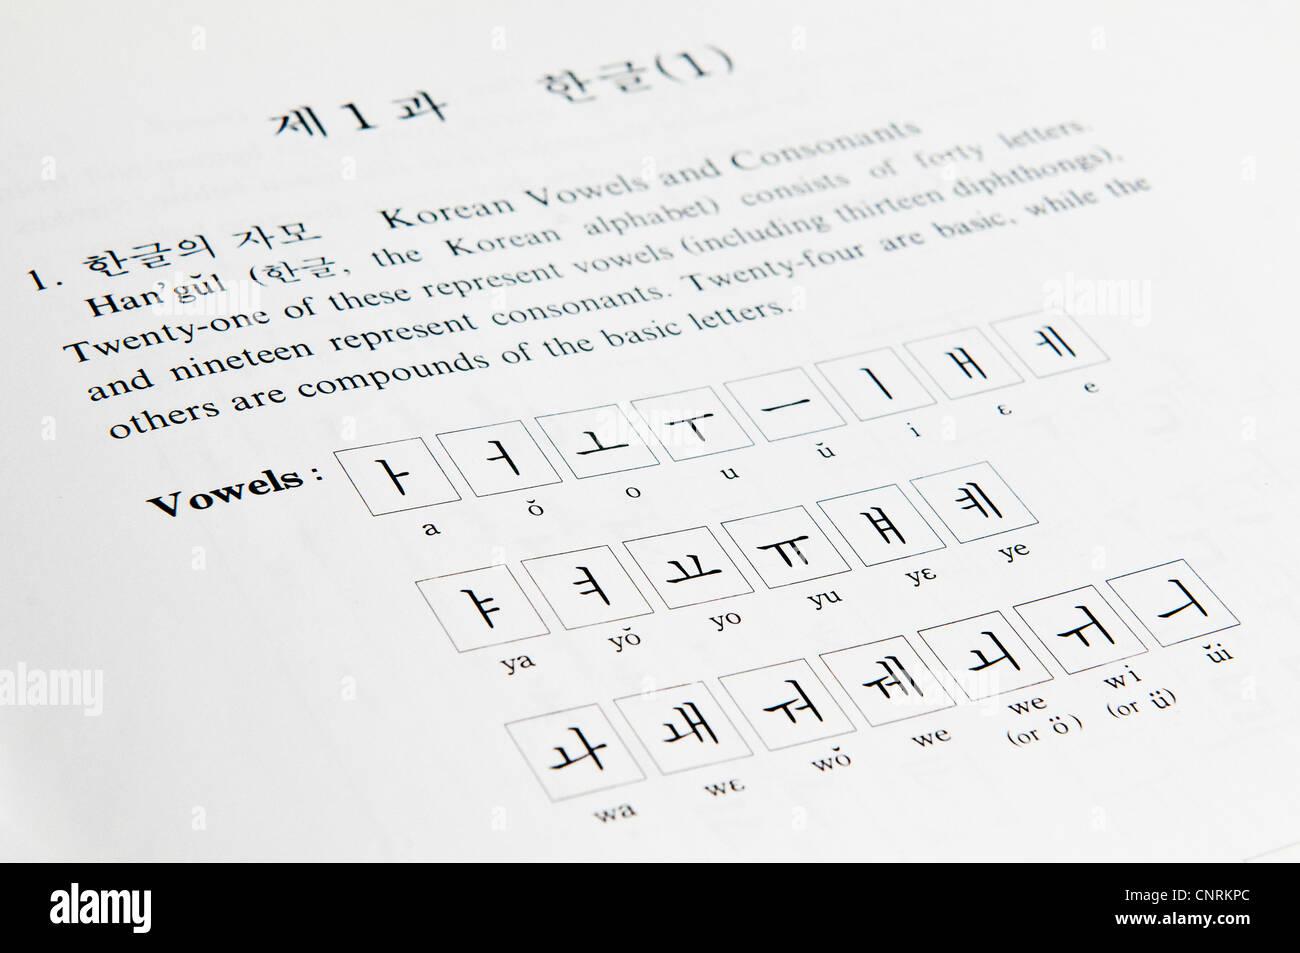 Hangul Script Stock Photos Hangul Script Stock Images Alamy